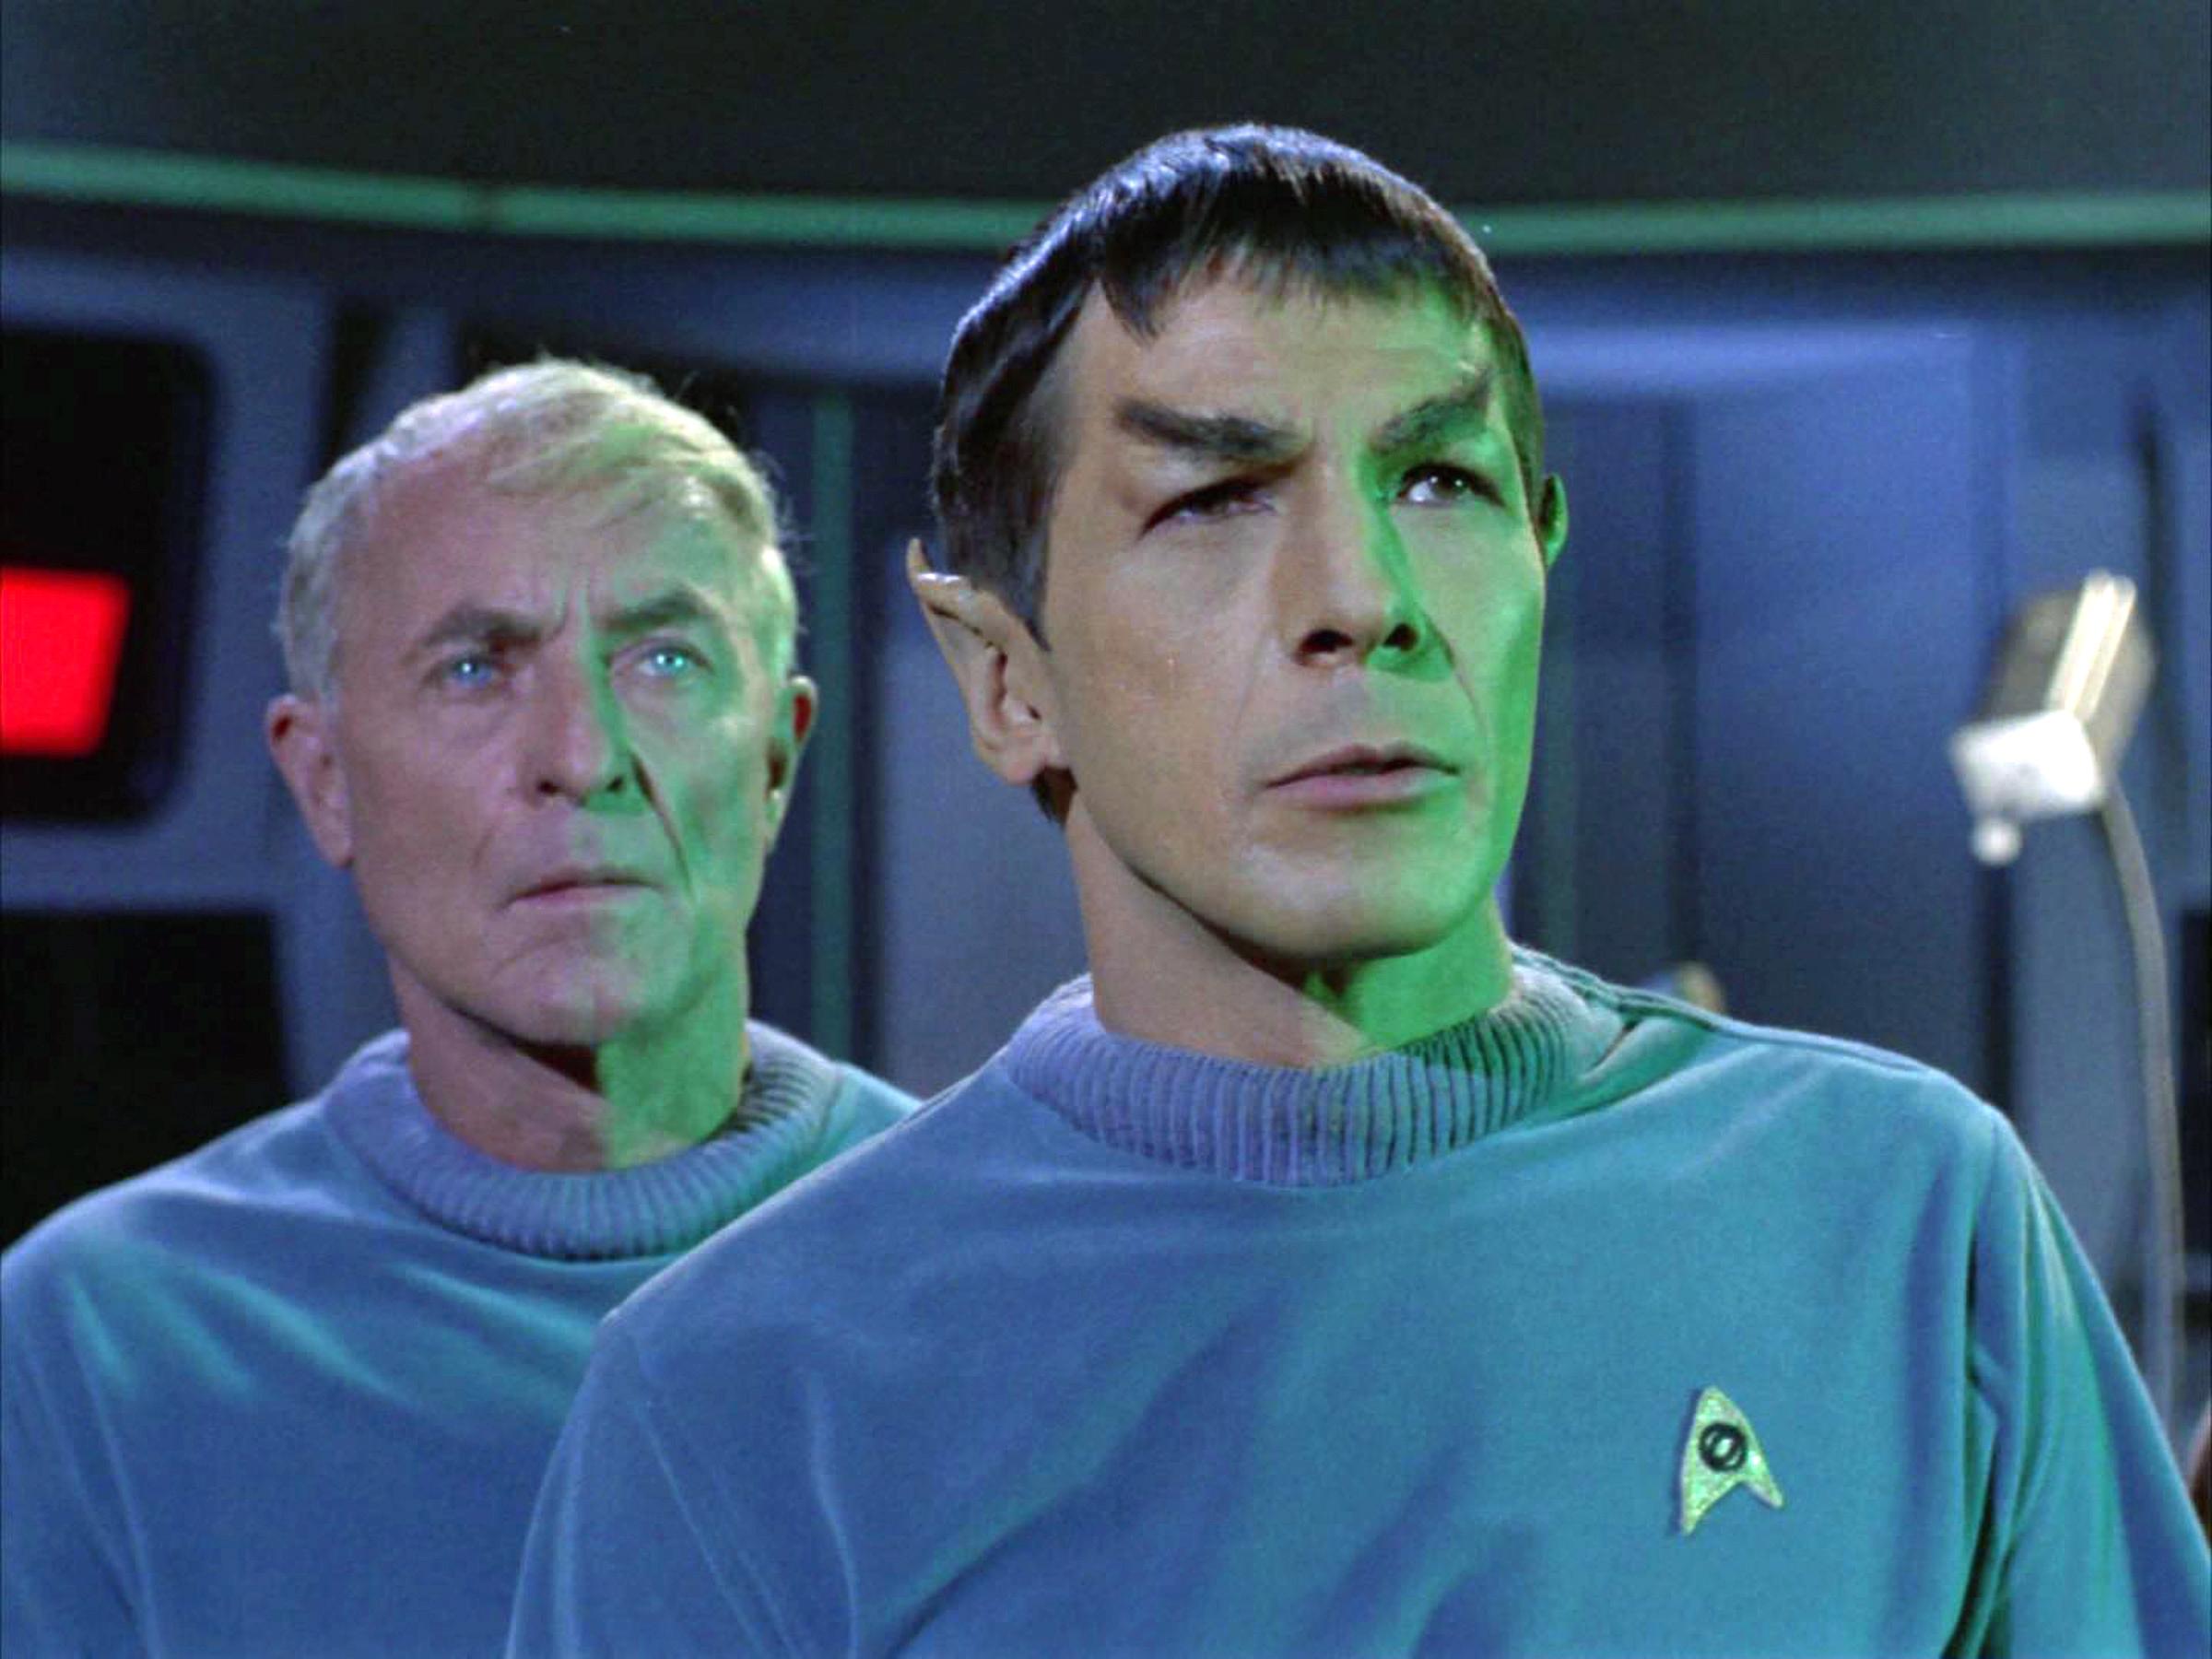 John Hoyt as Dr. Phillip Boyce and Leonard Nimoy as Mr. Spock.